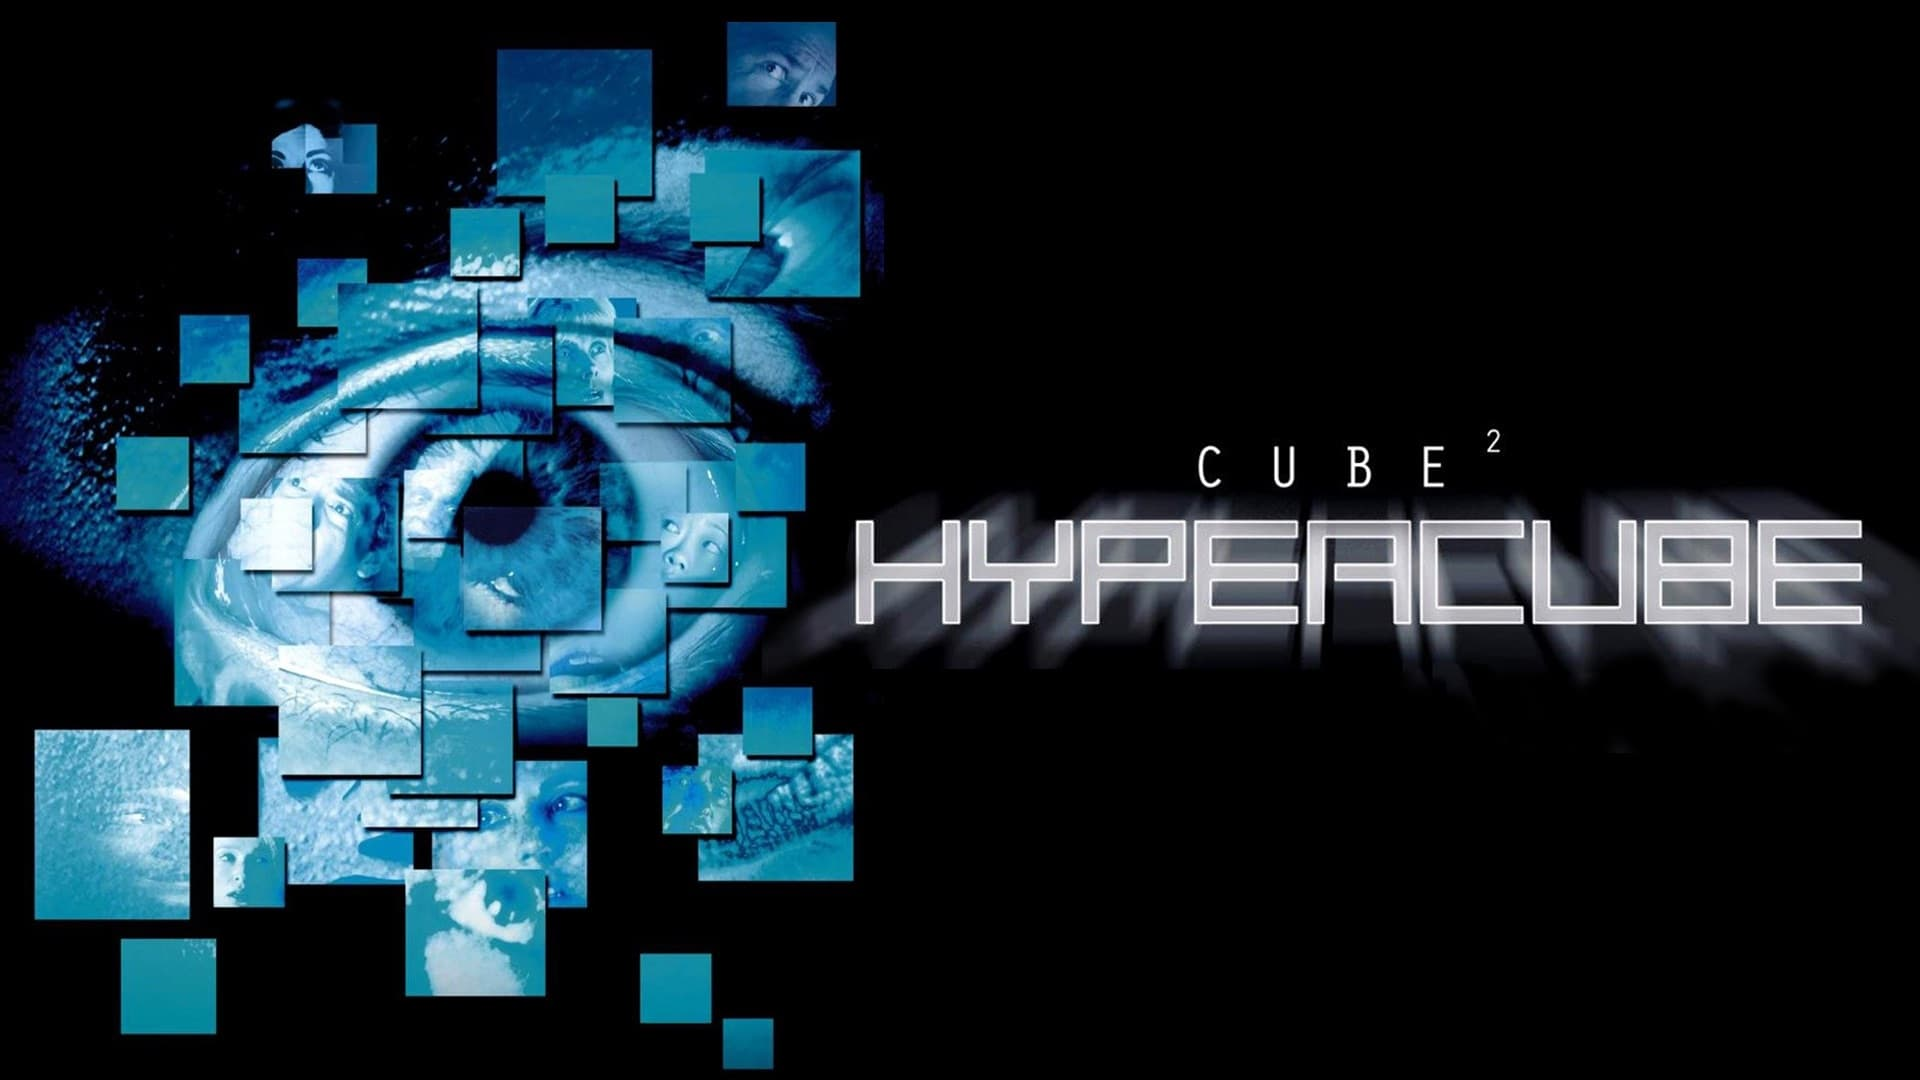 Cube 2: Hypercube Movie